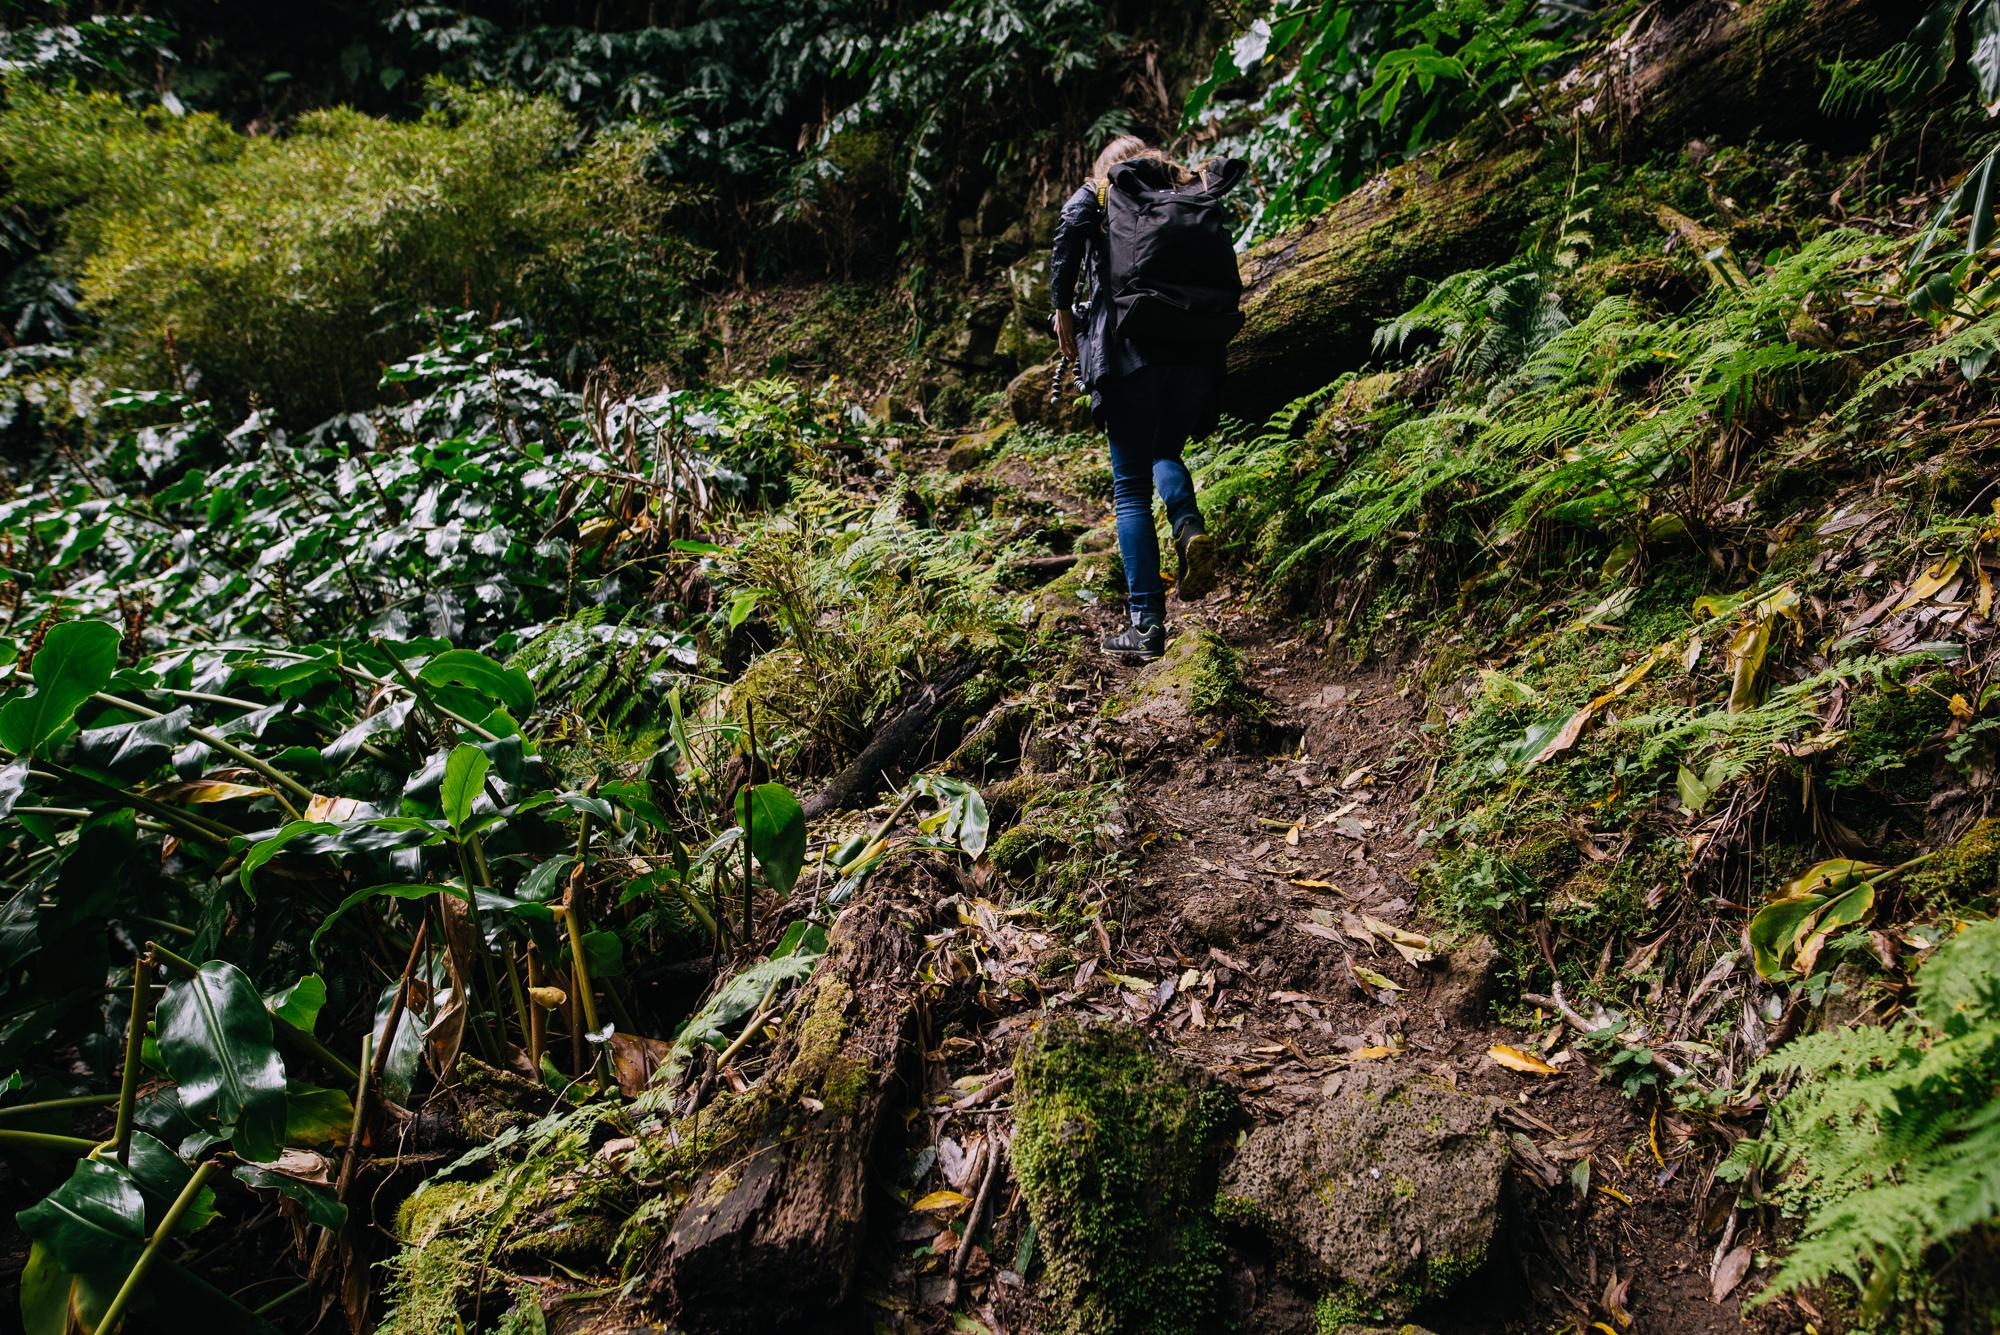 Faial de Terra túraösvény Sao Miguel szigetén